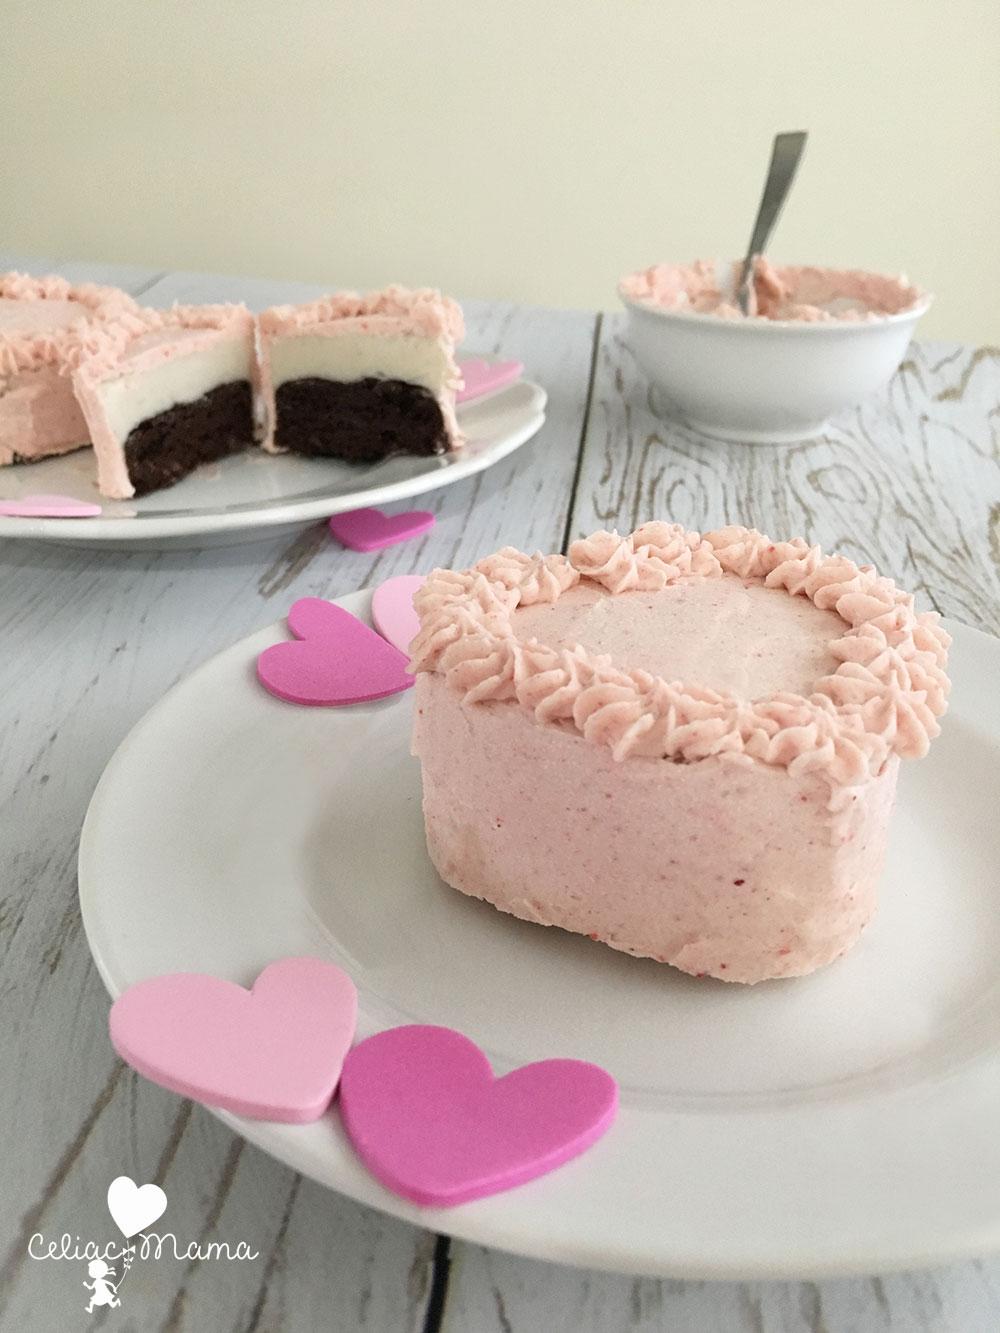 gluten-free-ice-cream-brownie-cake-celiac-mama-4